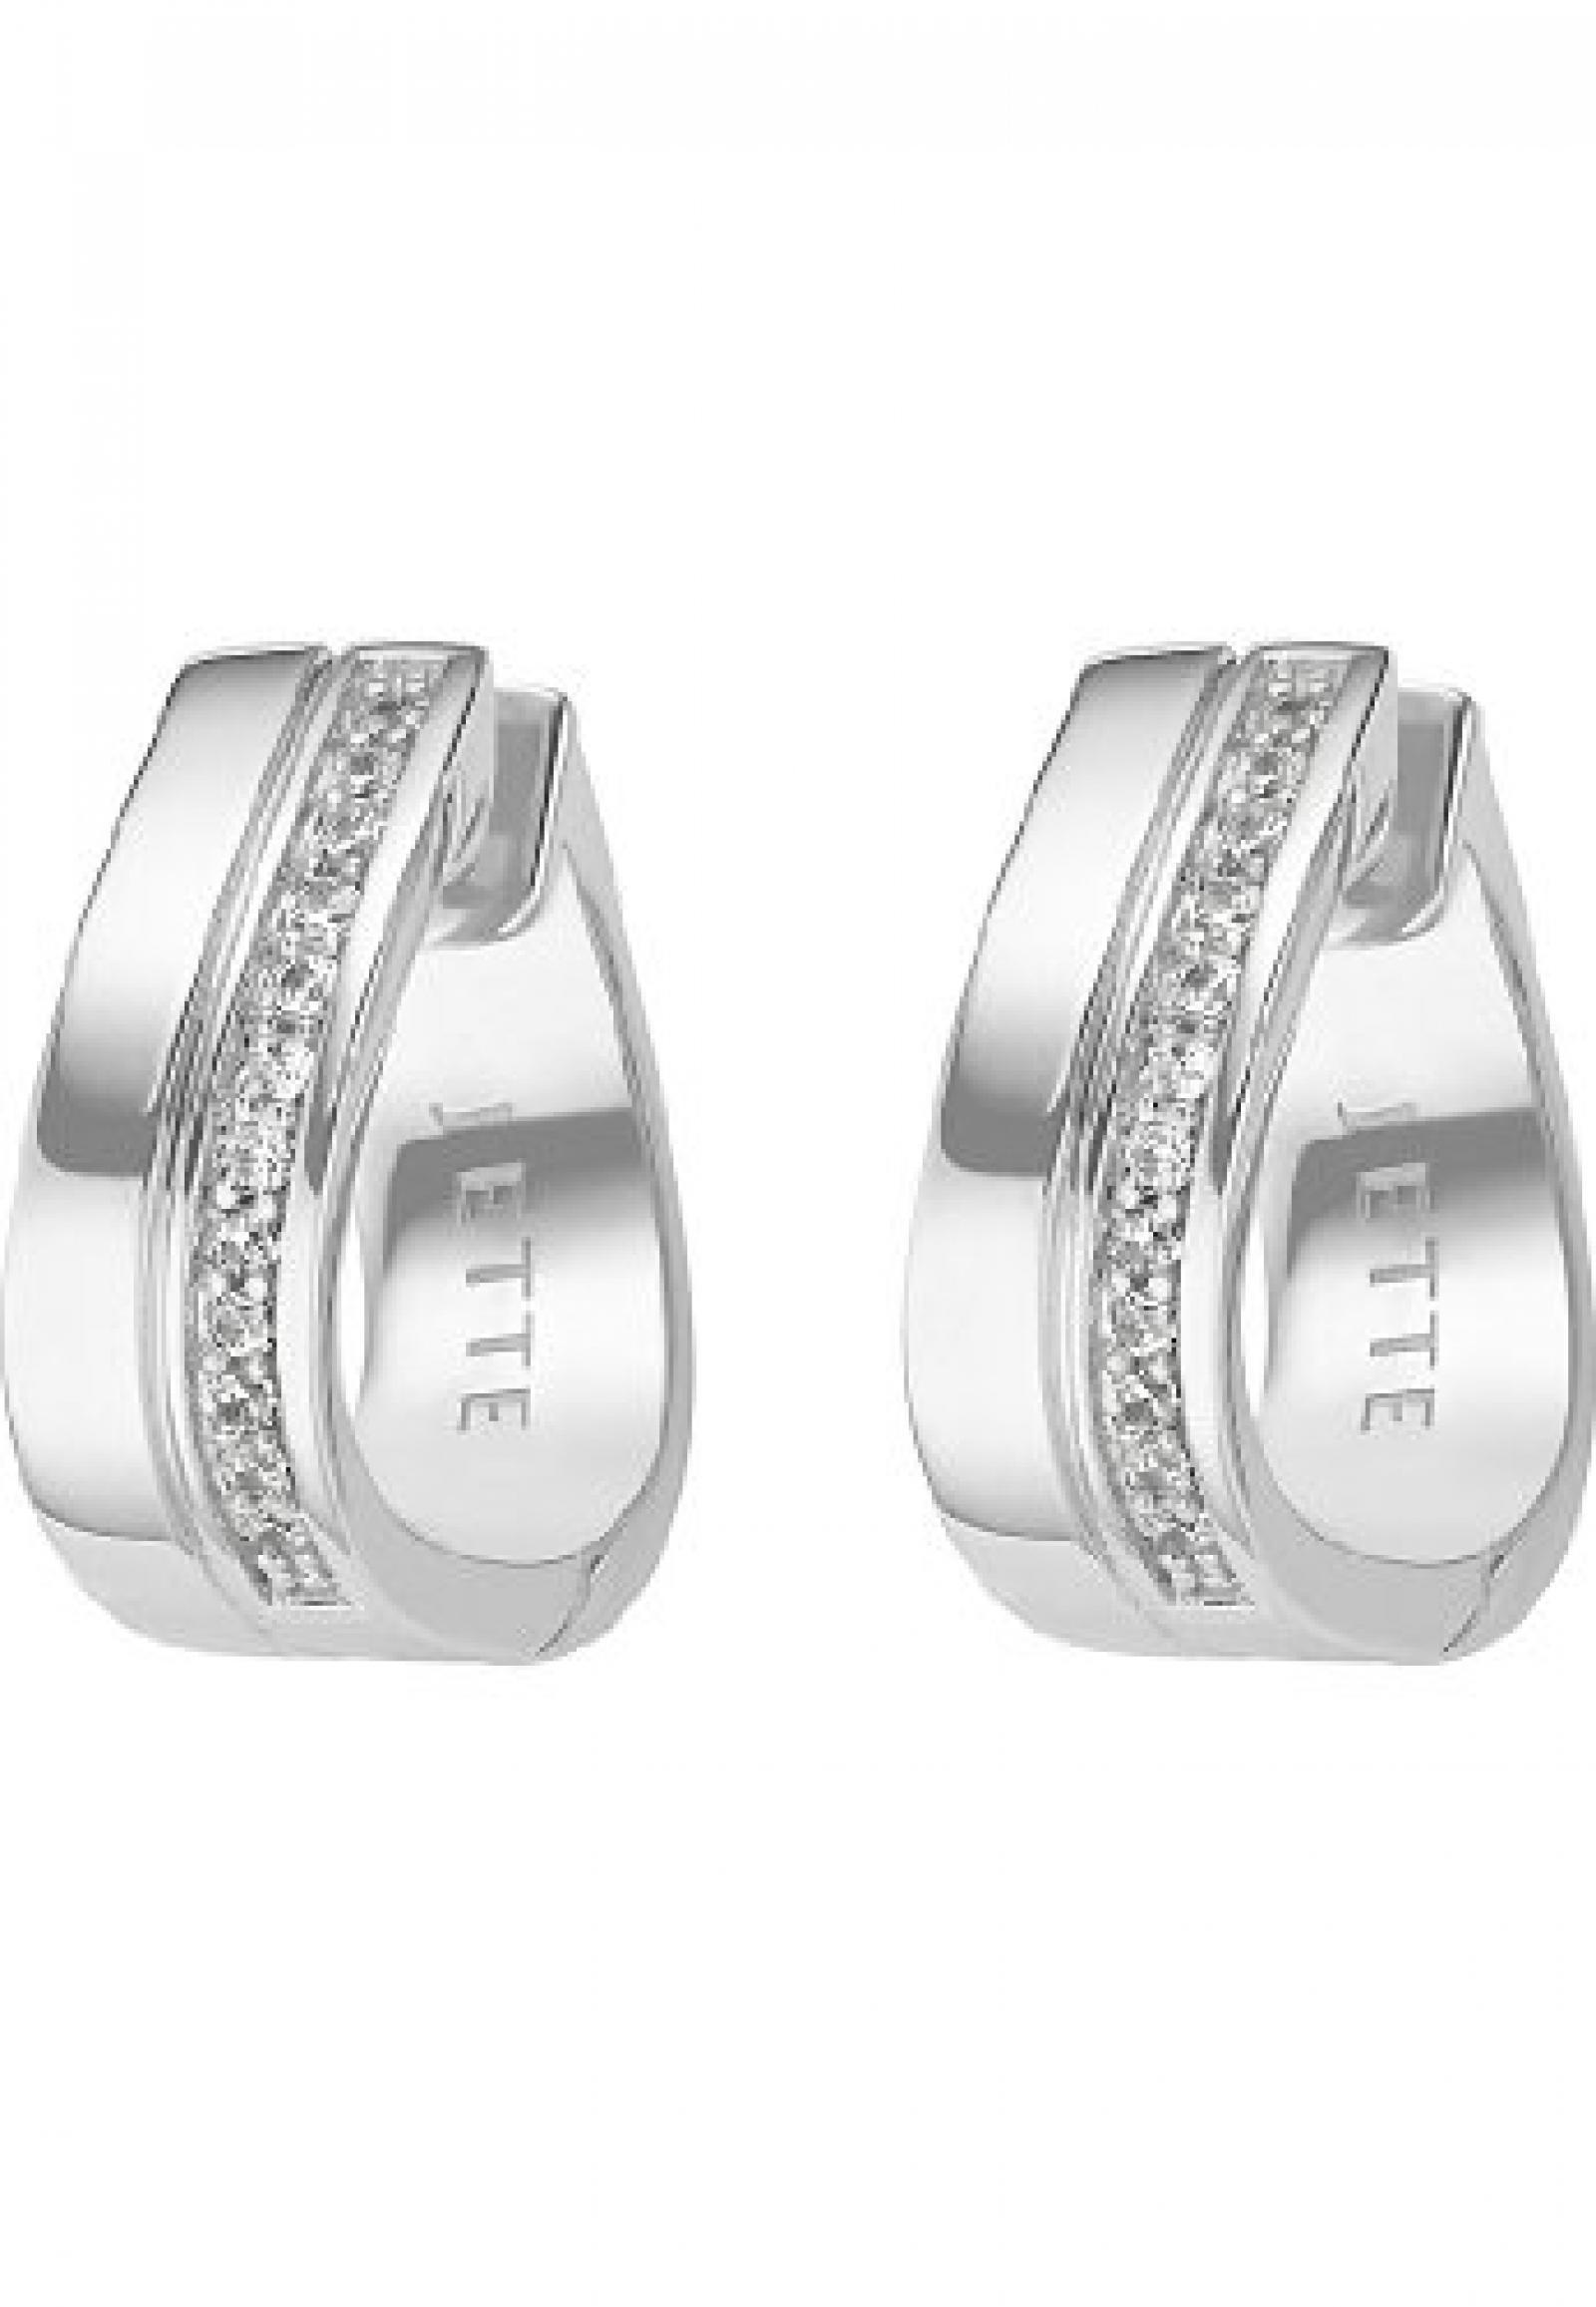 JETTE Silver Damen-Creole Free Spirit 925er Silber rhodiniert 24 Zirkonia One Size, silber